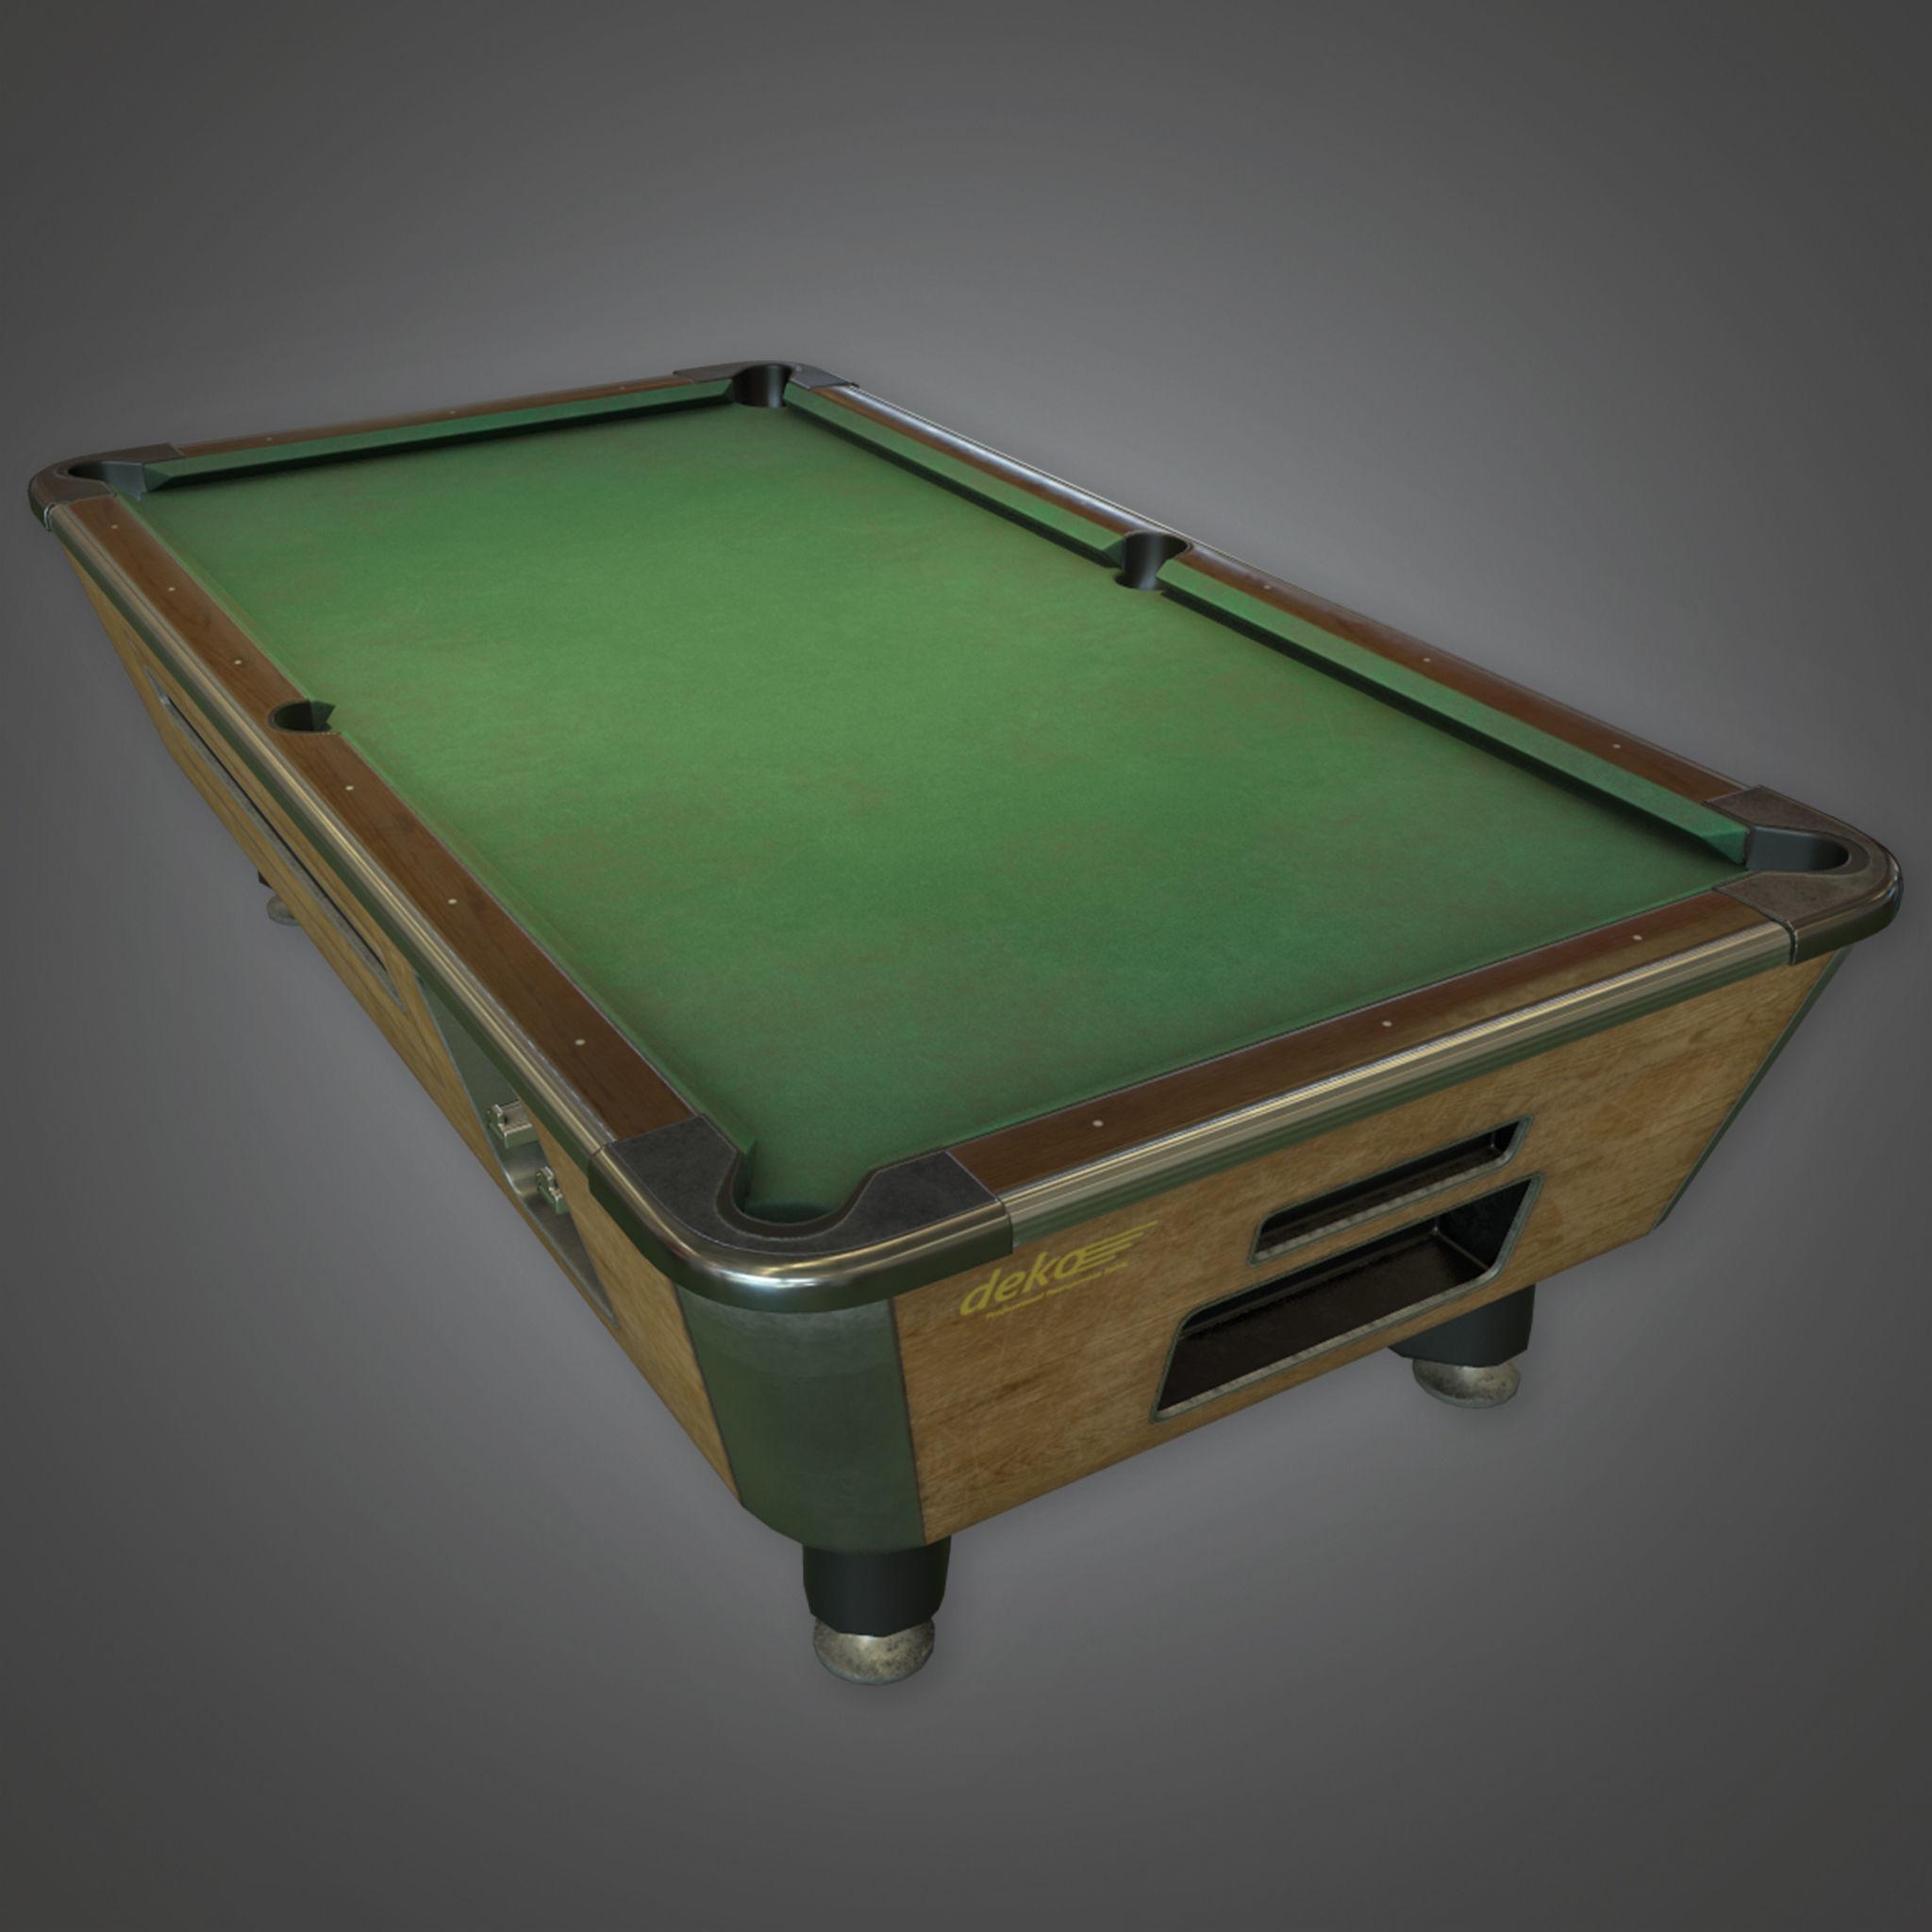 DVB - Pool Table - PBR Game Ready